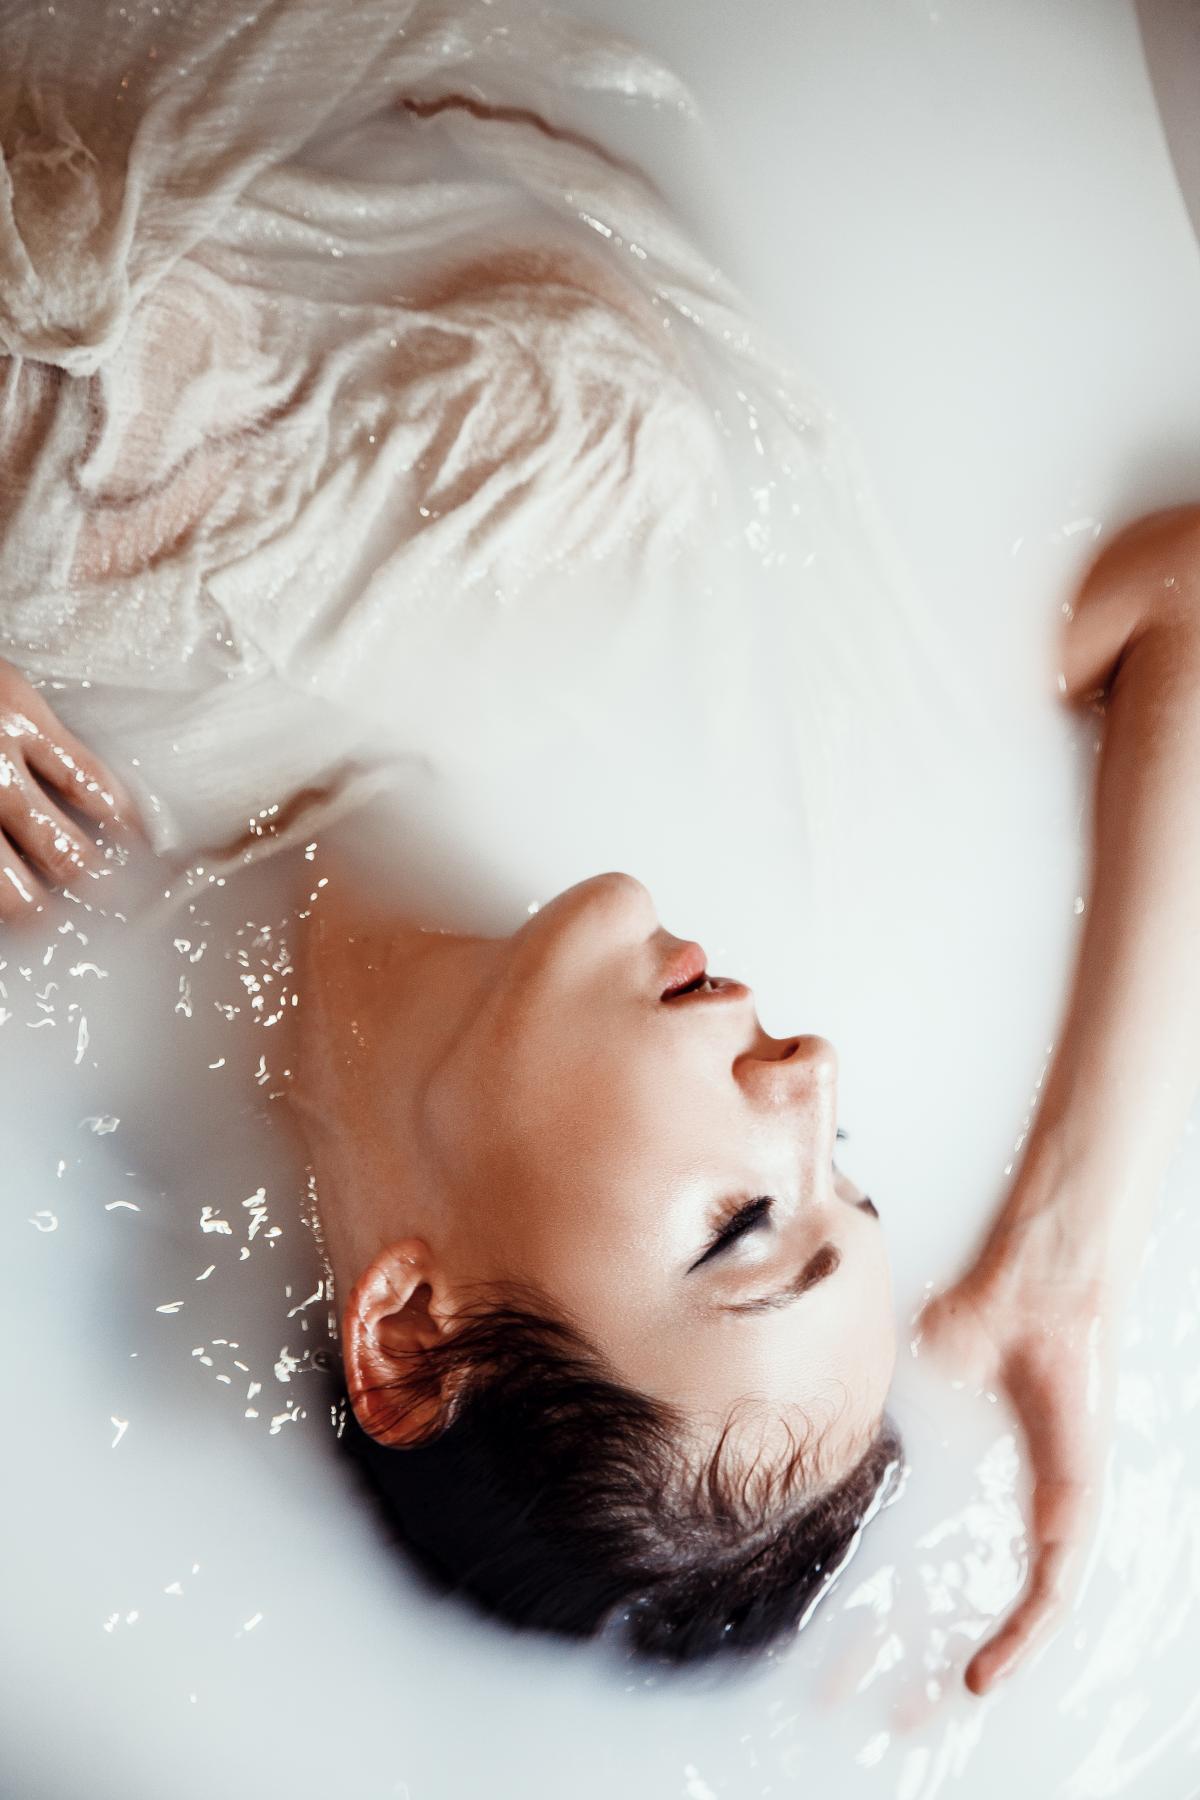 Woman Relaxing In A Tub Of Milk Bath #426376